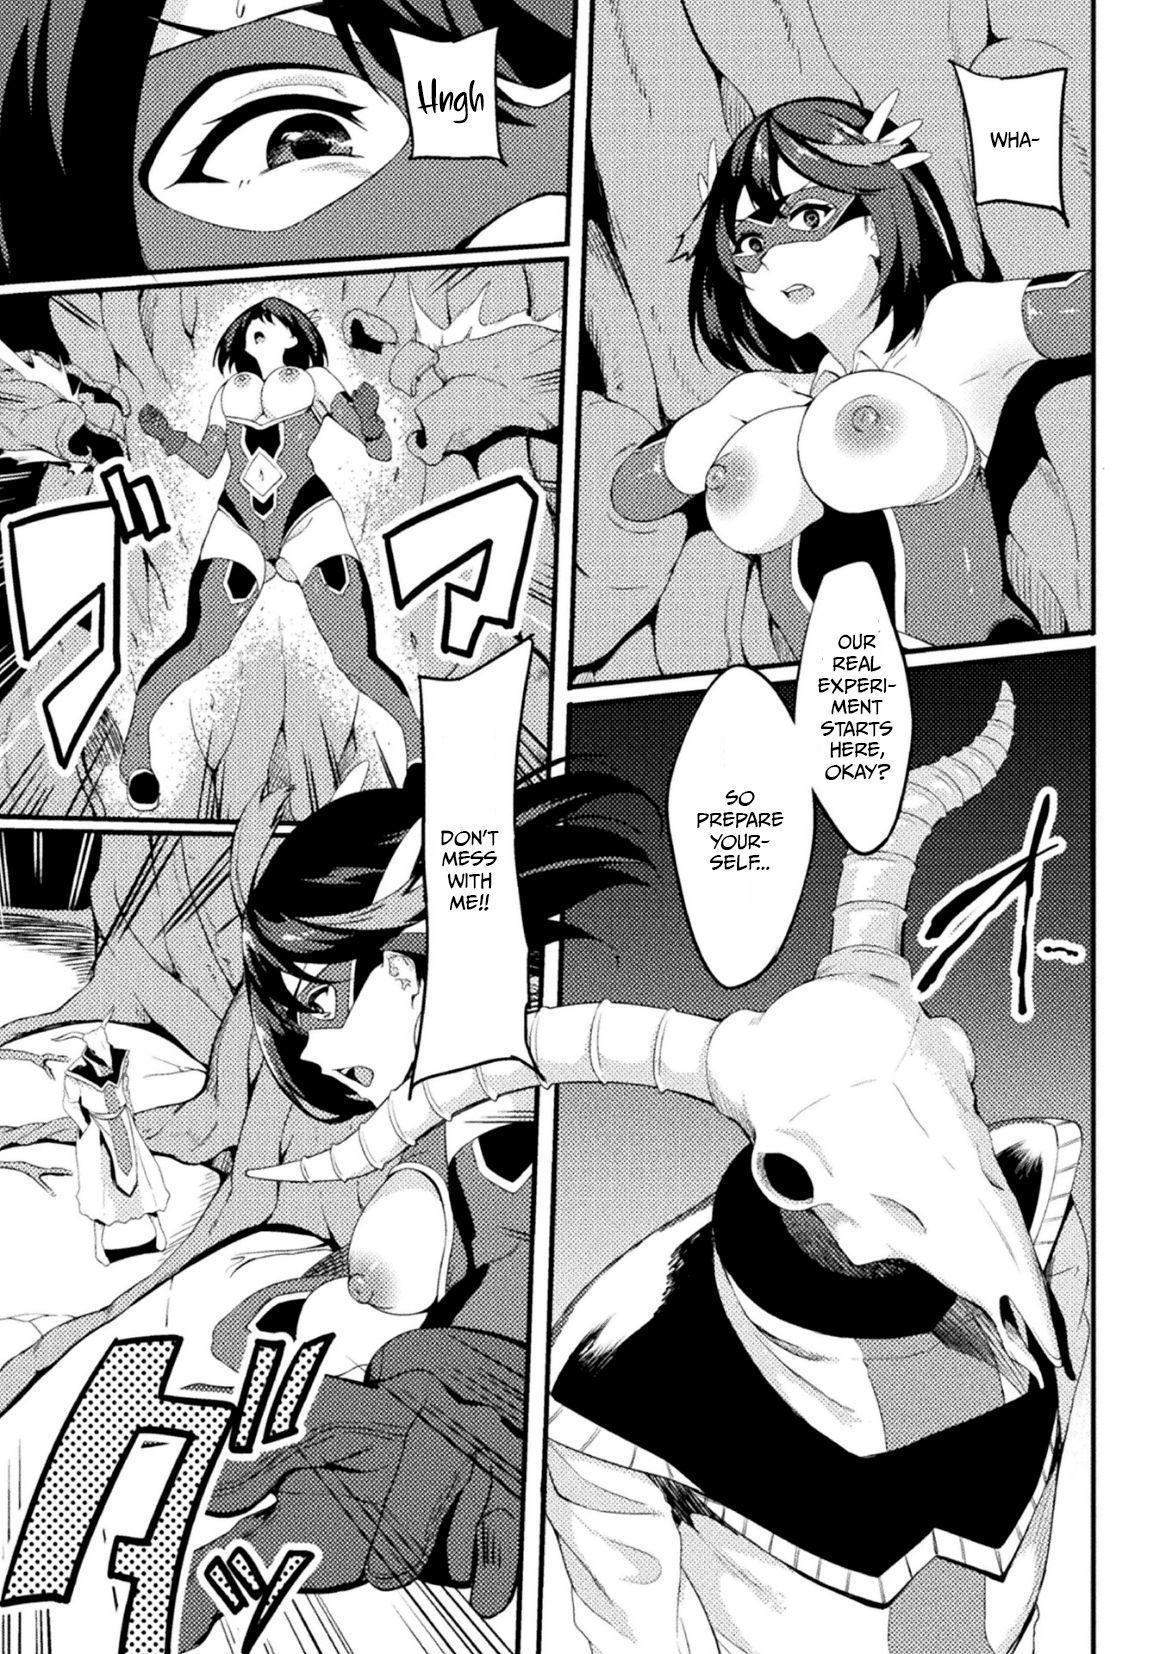 [Rinsun] Power Girl ~JK Super Heroine no Saiin Darakuki~ Ch. 2|Power Girl ~JK Super Heroine's Aphrodisiac Corruption Record~ Ch. 2 [English] [Neraka Translations] 4